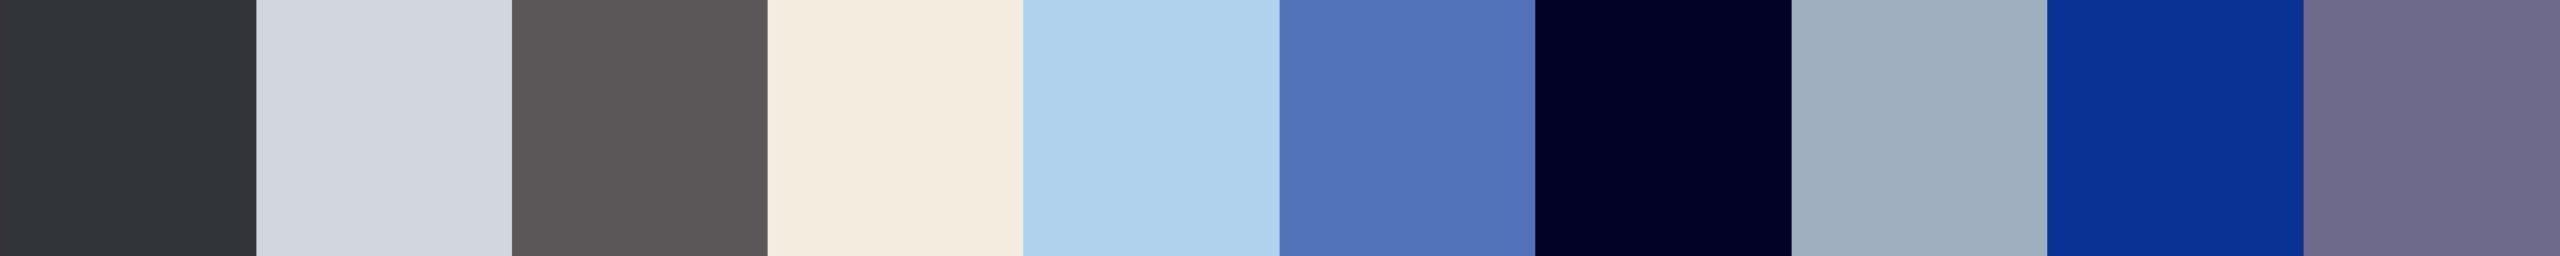 736 Stahixa Color Palette